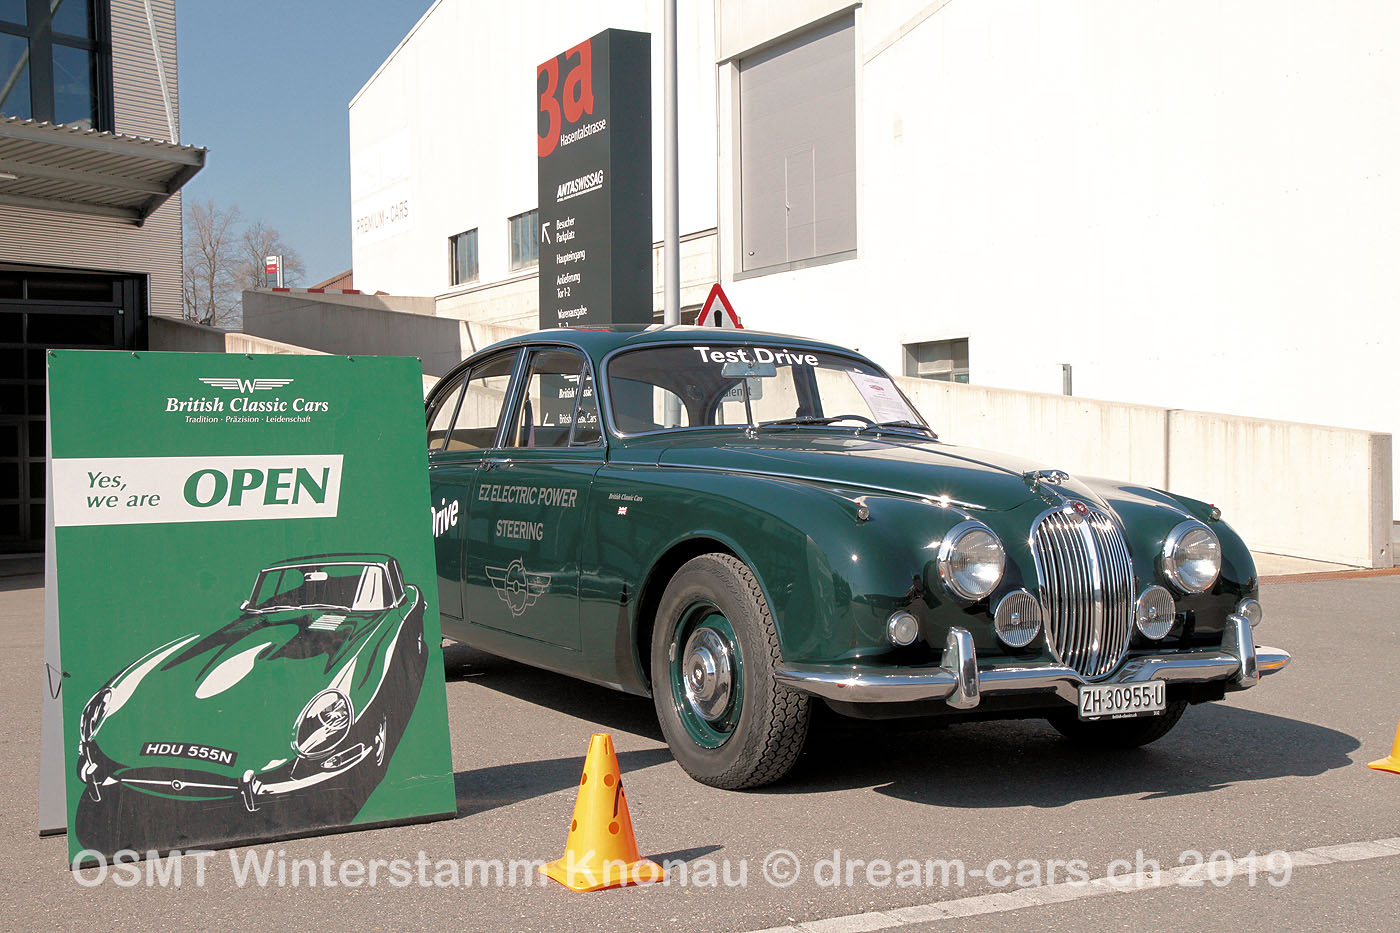 OSMT Winterstamm bei British Classic Cars Knonau